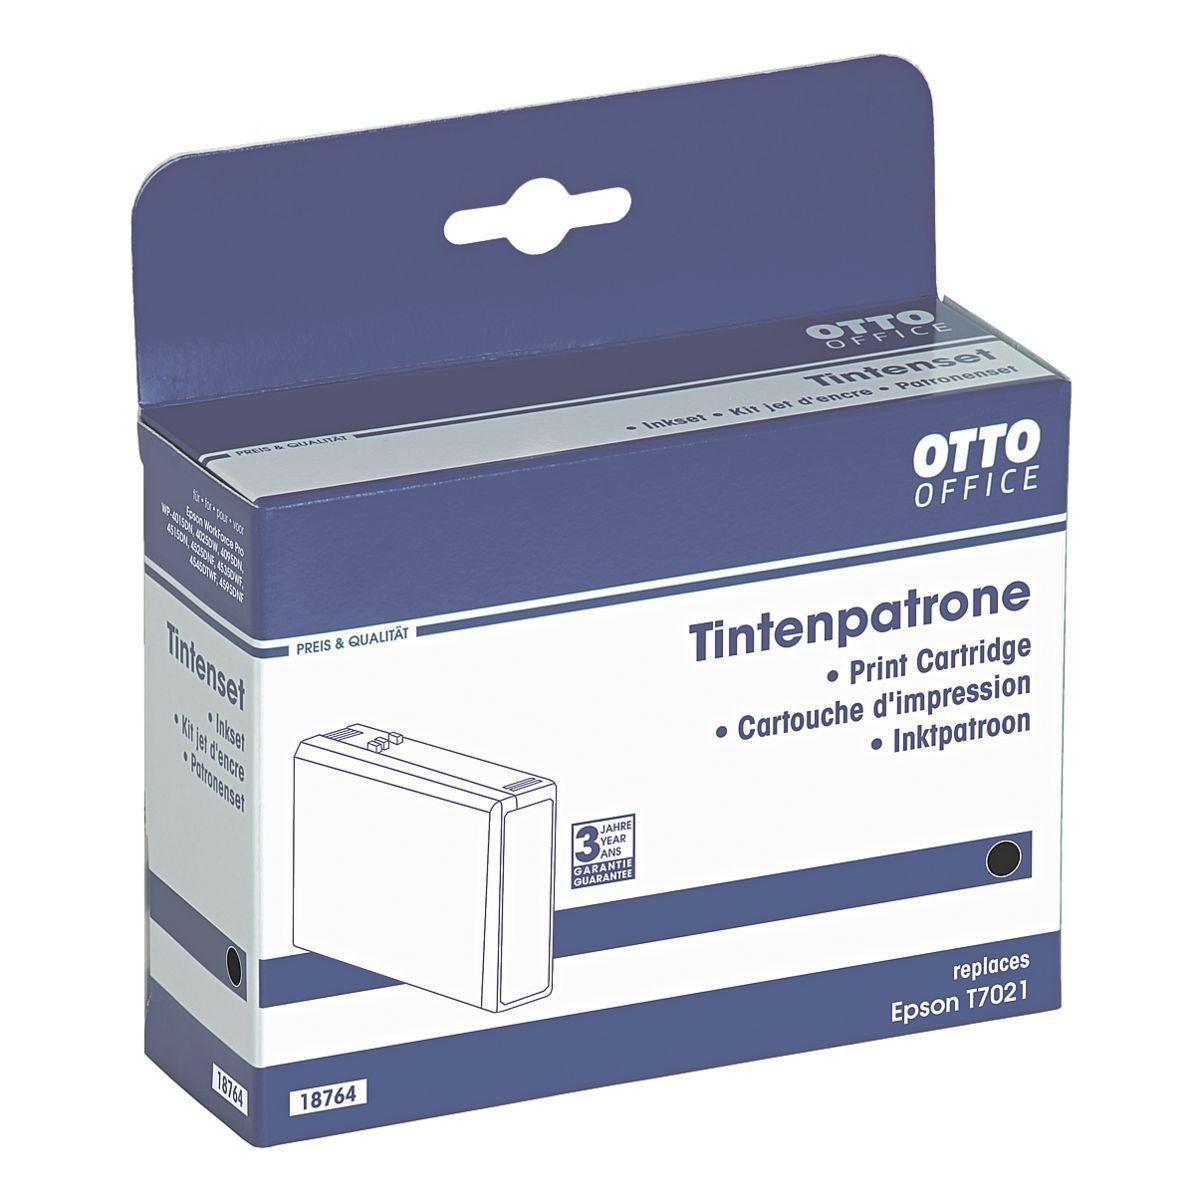 OTTO Office Standard Tintenpatrone ersetzt Epson »T0721«